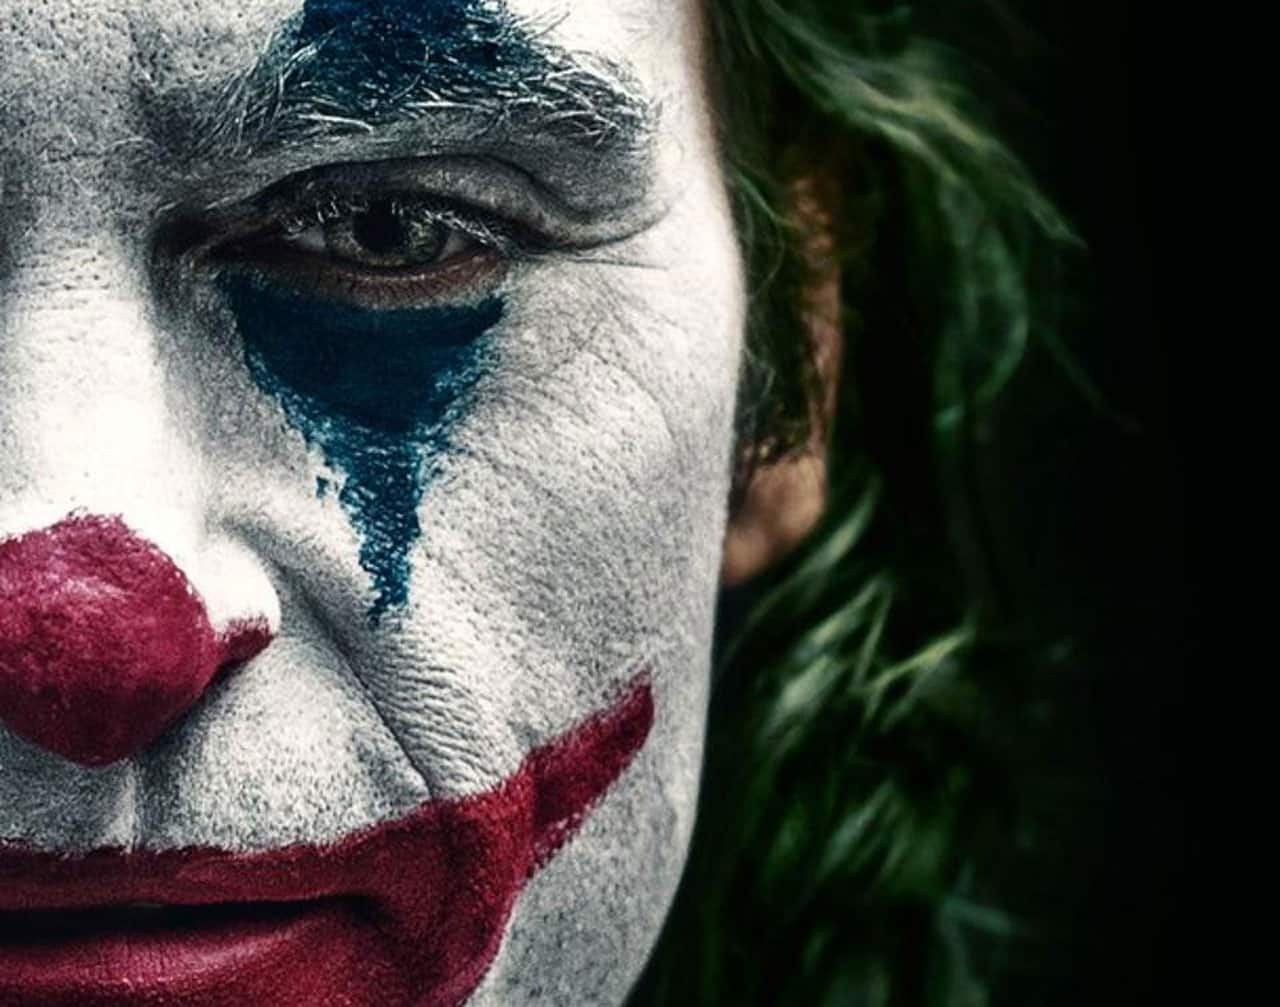 Joker Oscar Nominations 2020 Revealed - 'Joker', and 'The Irishman' Lead Nominees